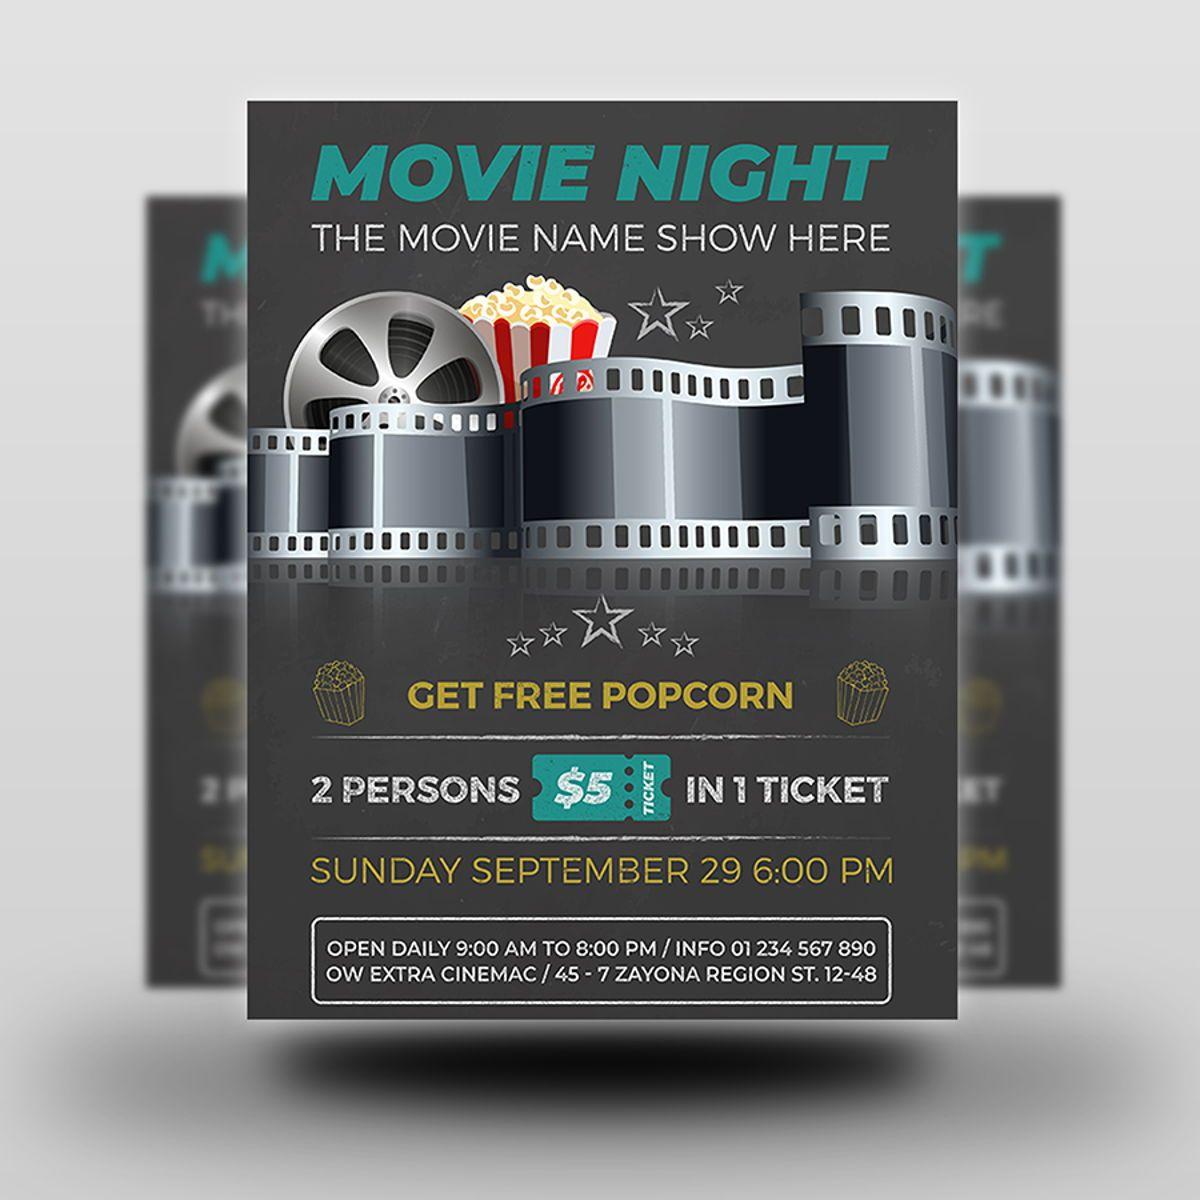 Movie Night - Movie Time Flyer Template, Slide 2, 08494, Art & Entertainment — PoweredTemplate.com